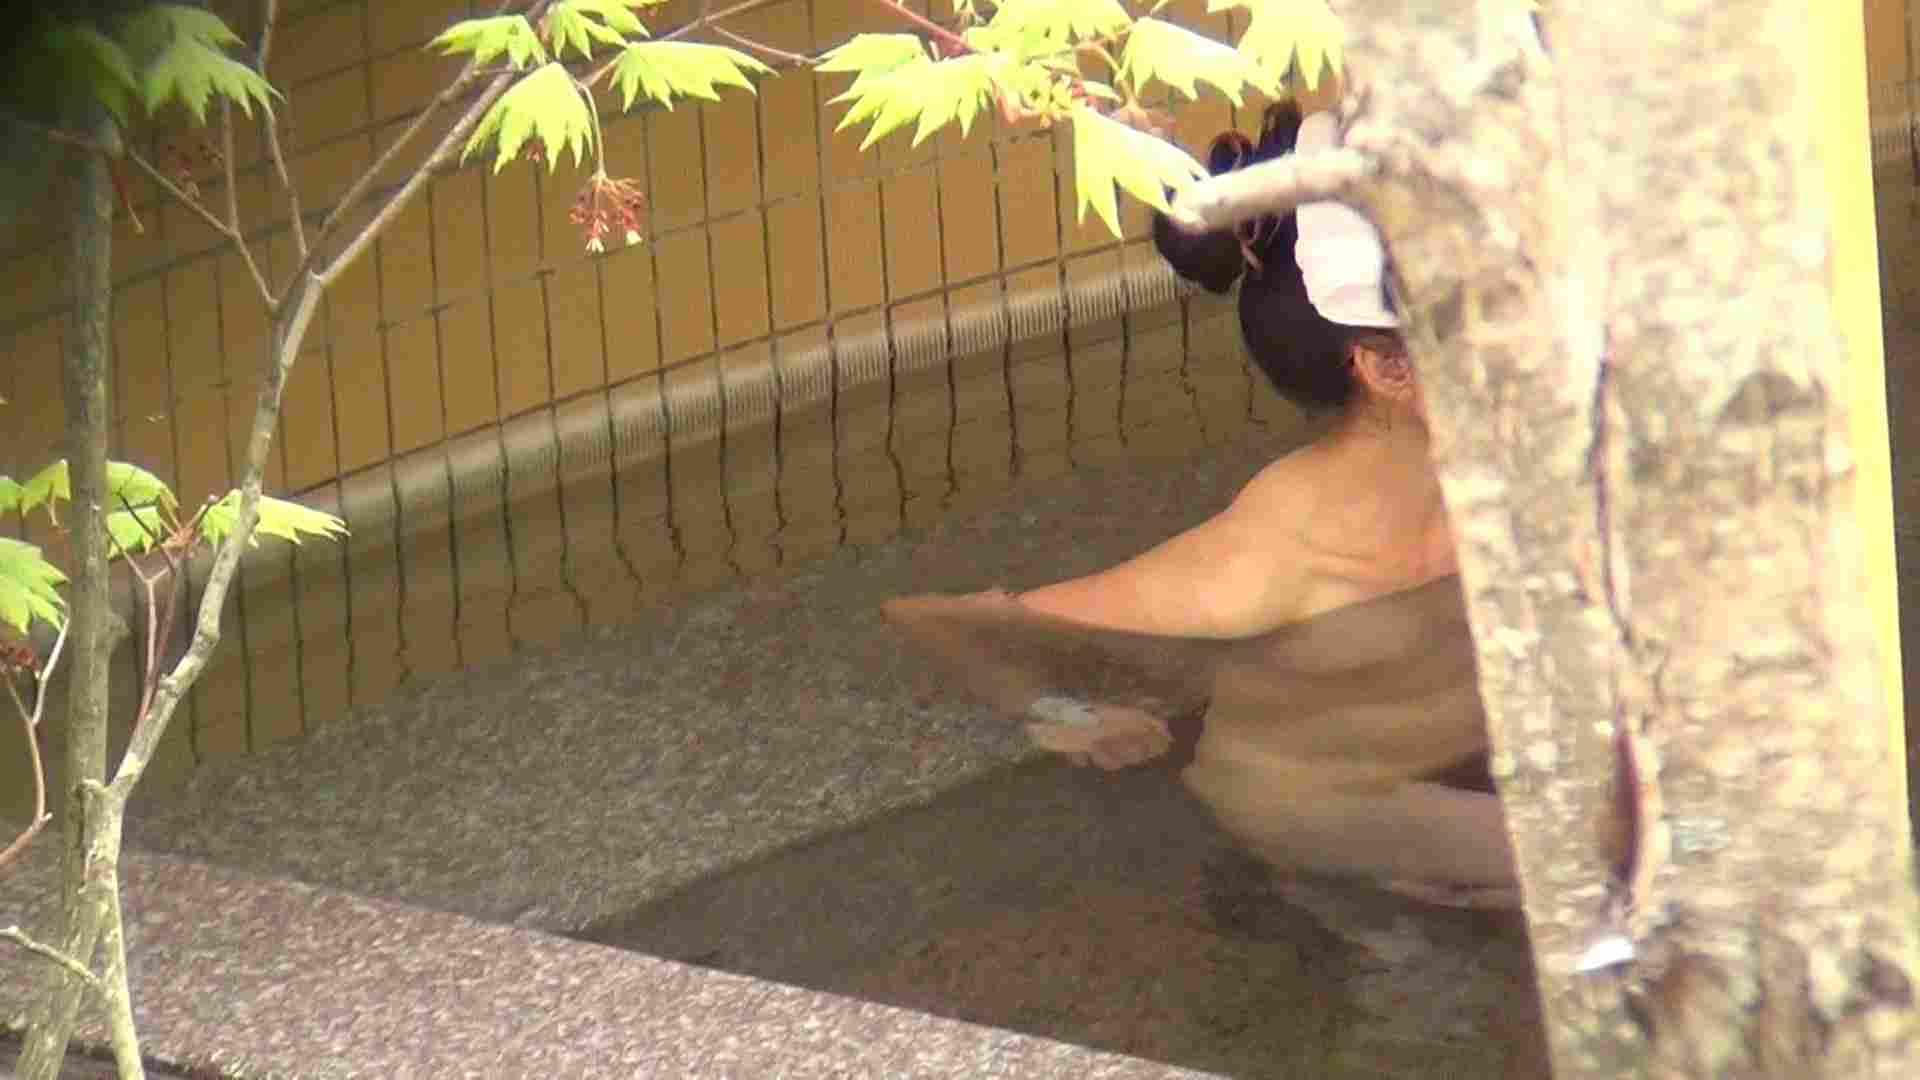 Aquaな露天風呂Vol.232 露天風呂編 | 盗撮シリーズ  105PIX 41